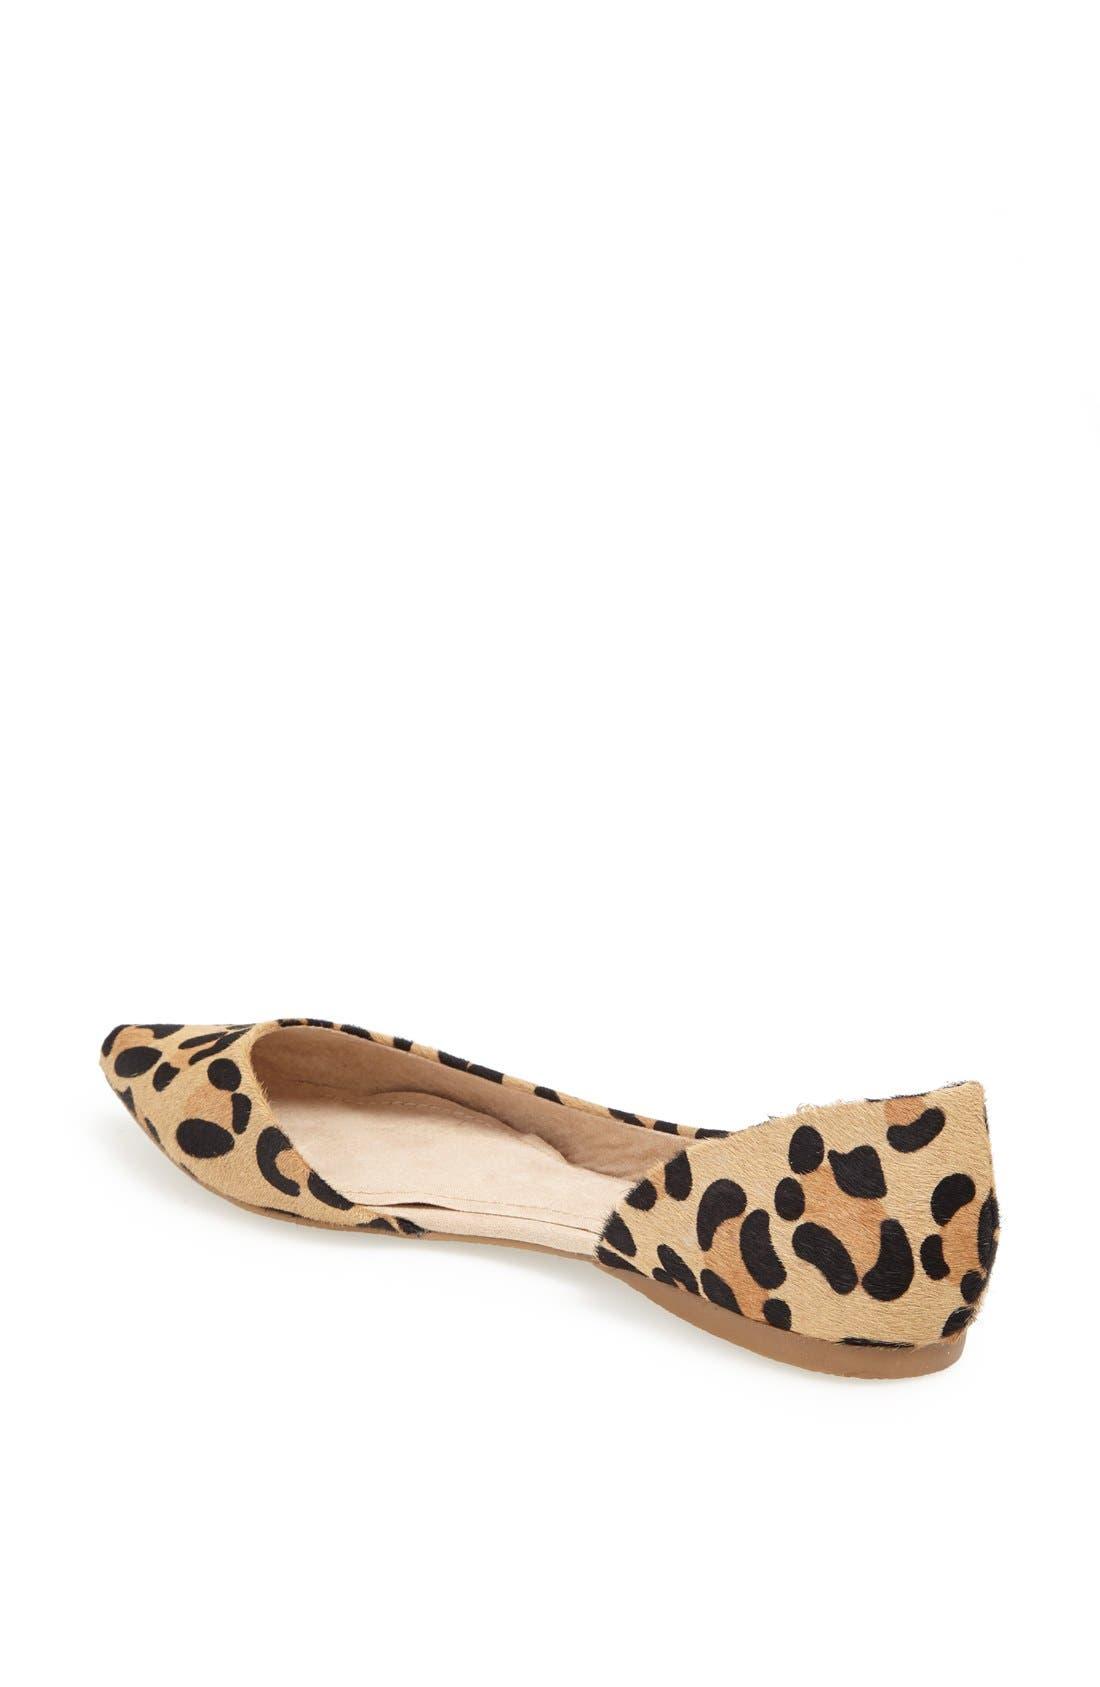 Alternate Image 2  - Steve Madden 'Elusion' Leopard Print Calf Hair Half d'Orsay Flat